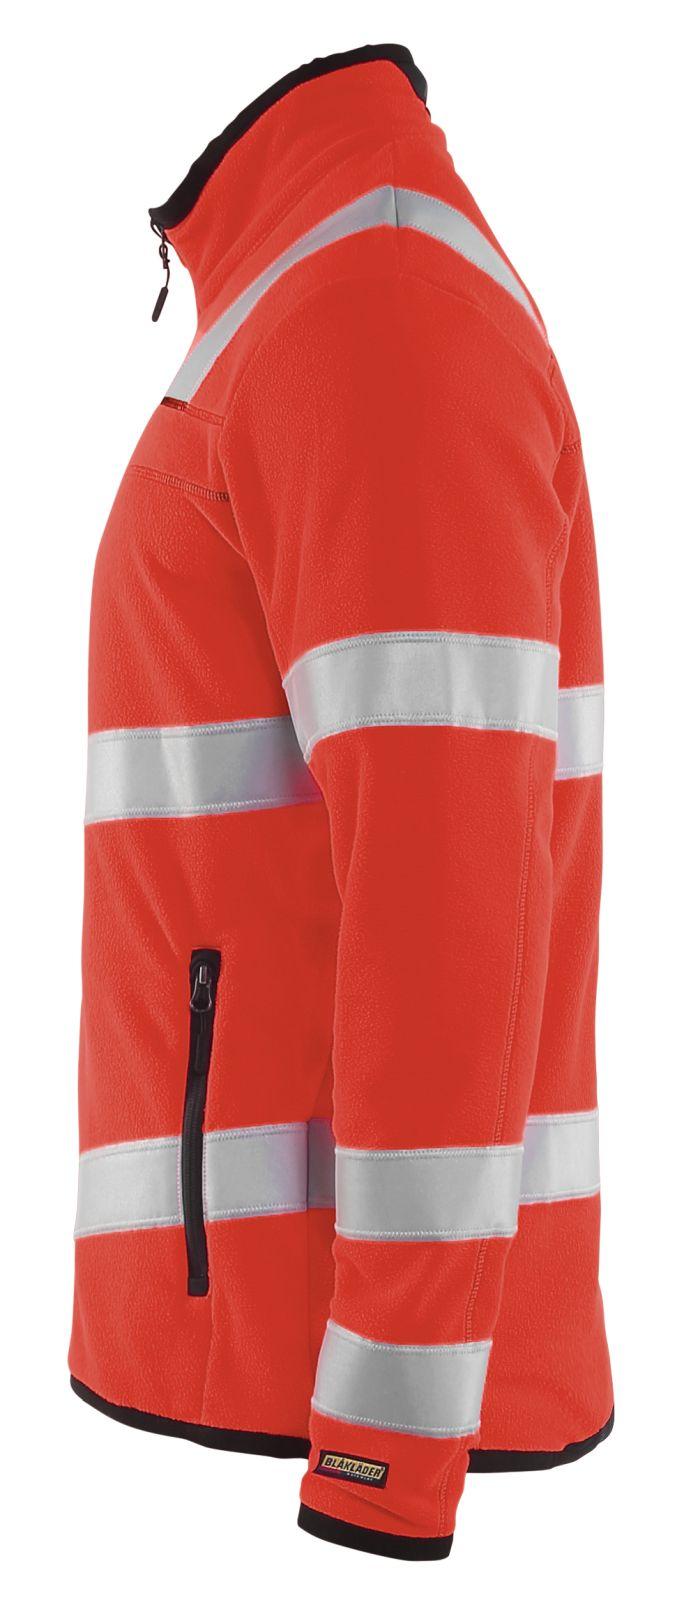 Blaklader Fleece vesten 49411010 High Vis fluor rood(5500)